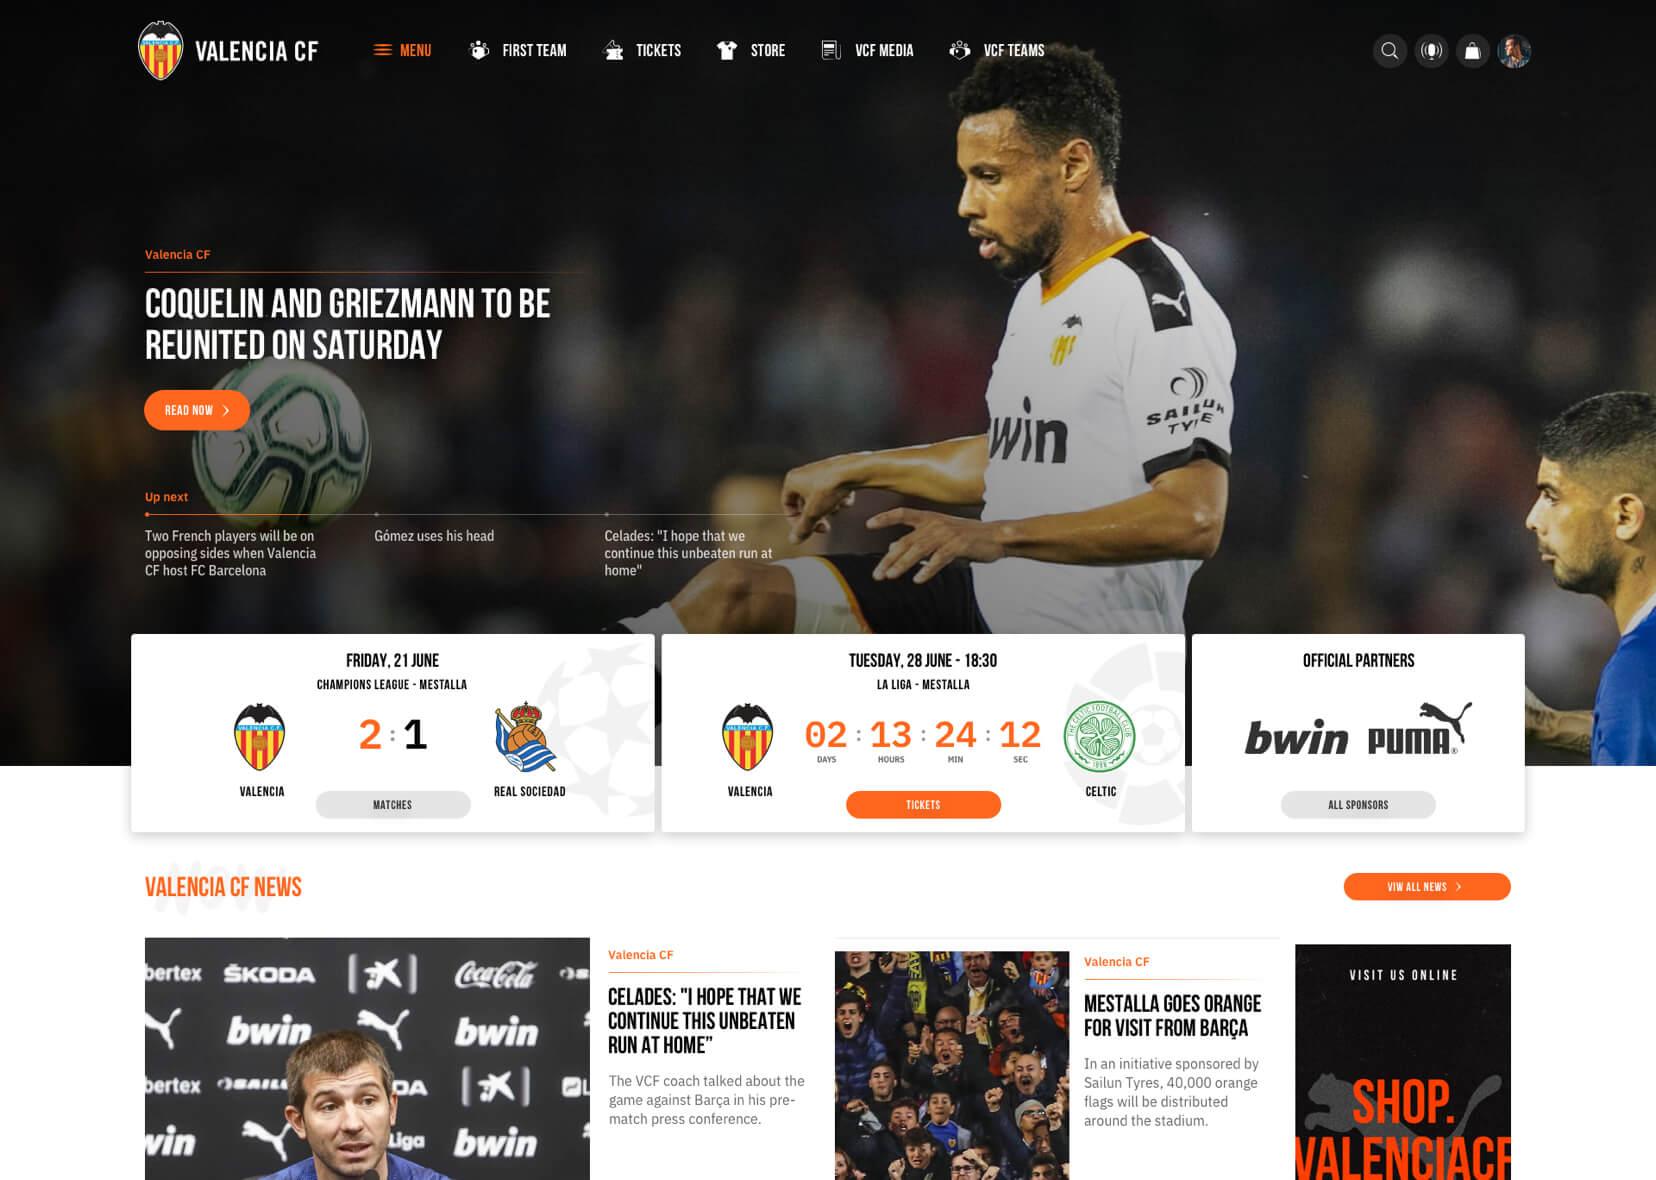 Valencia CF homepage